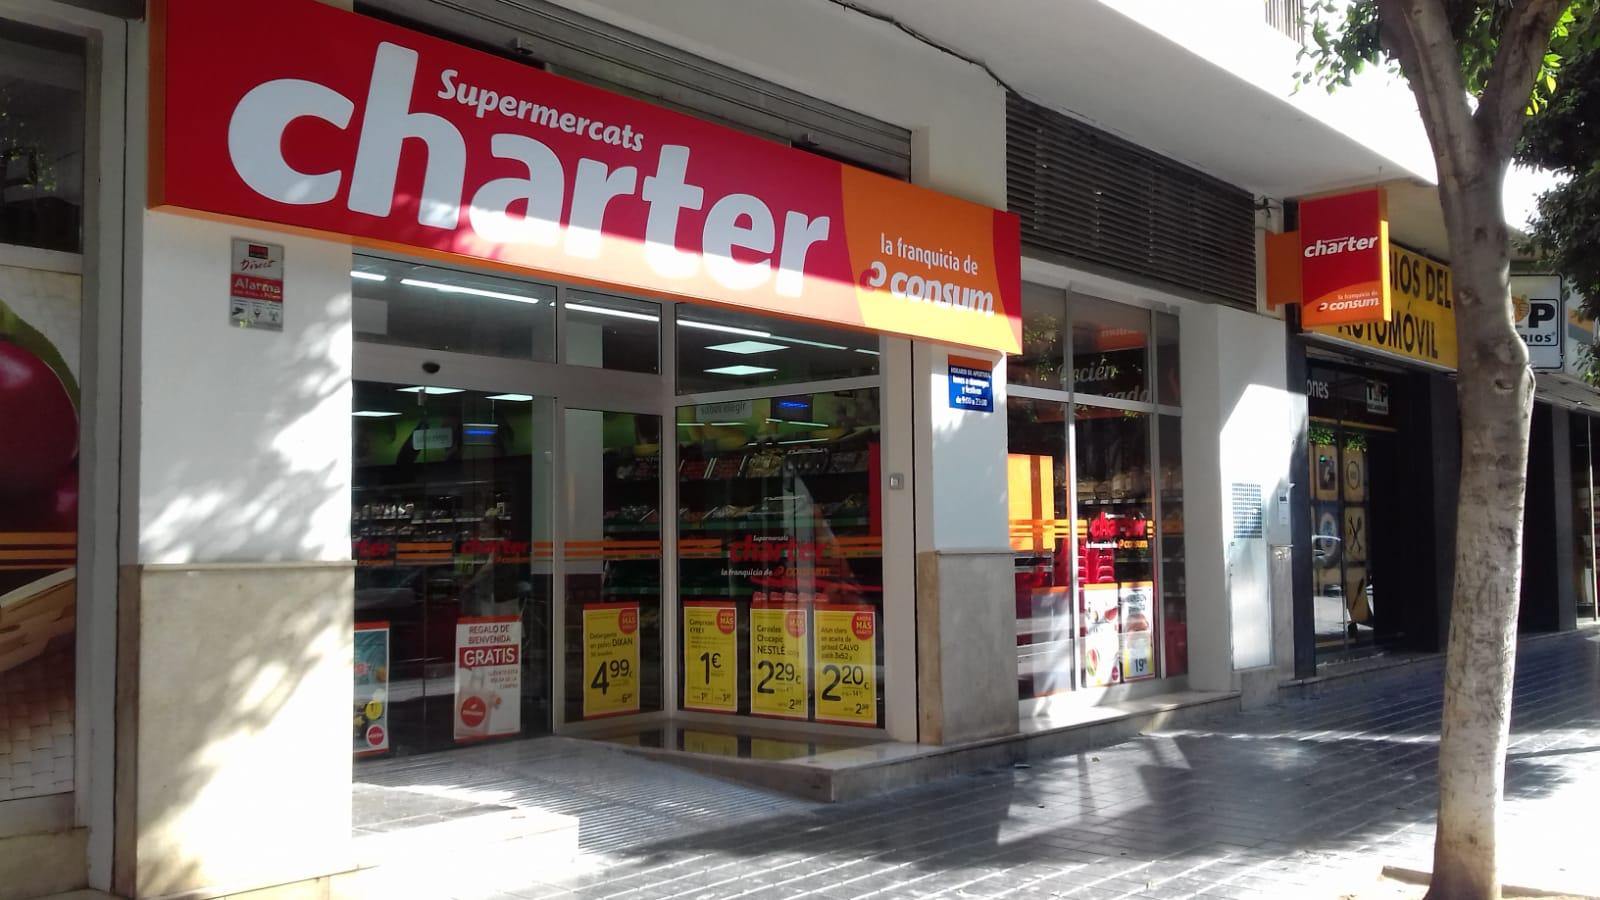 Charter Abre Un Nuevo Supermercado En Valencia Consum